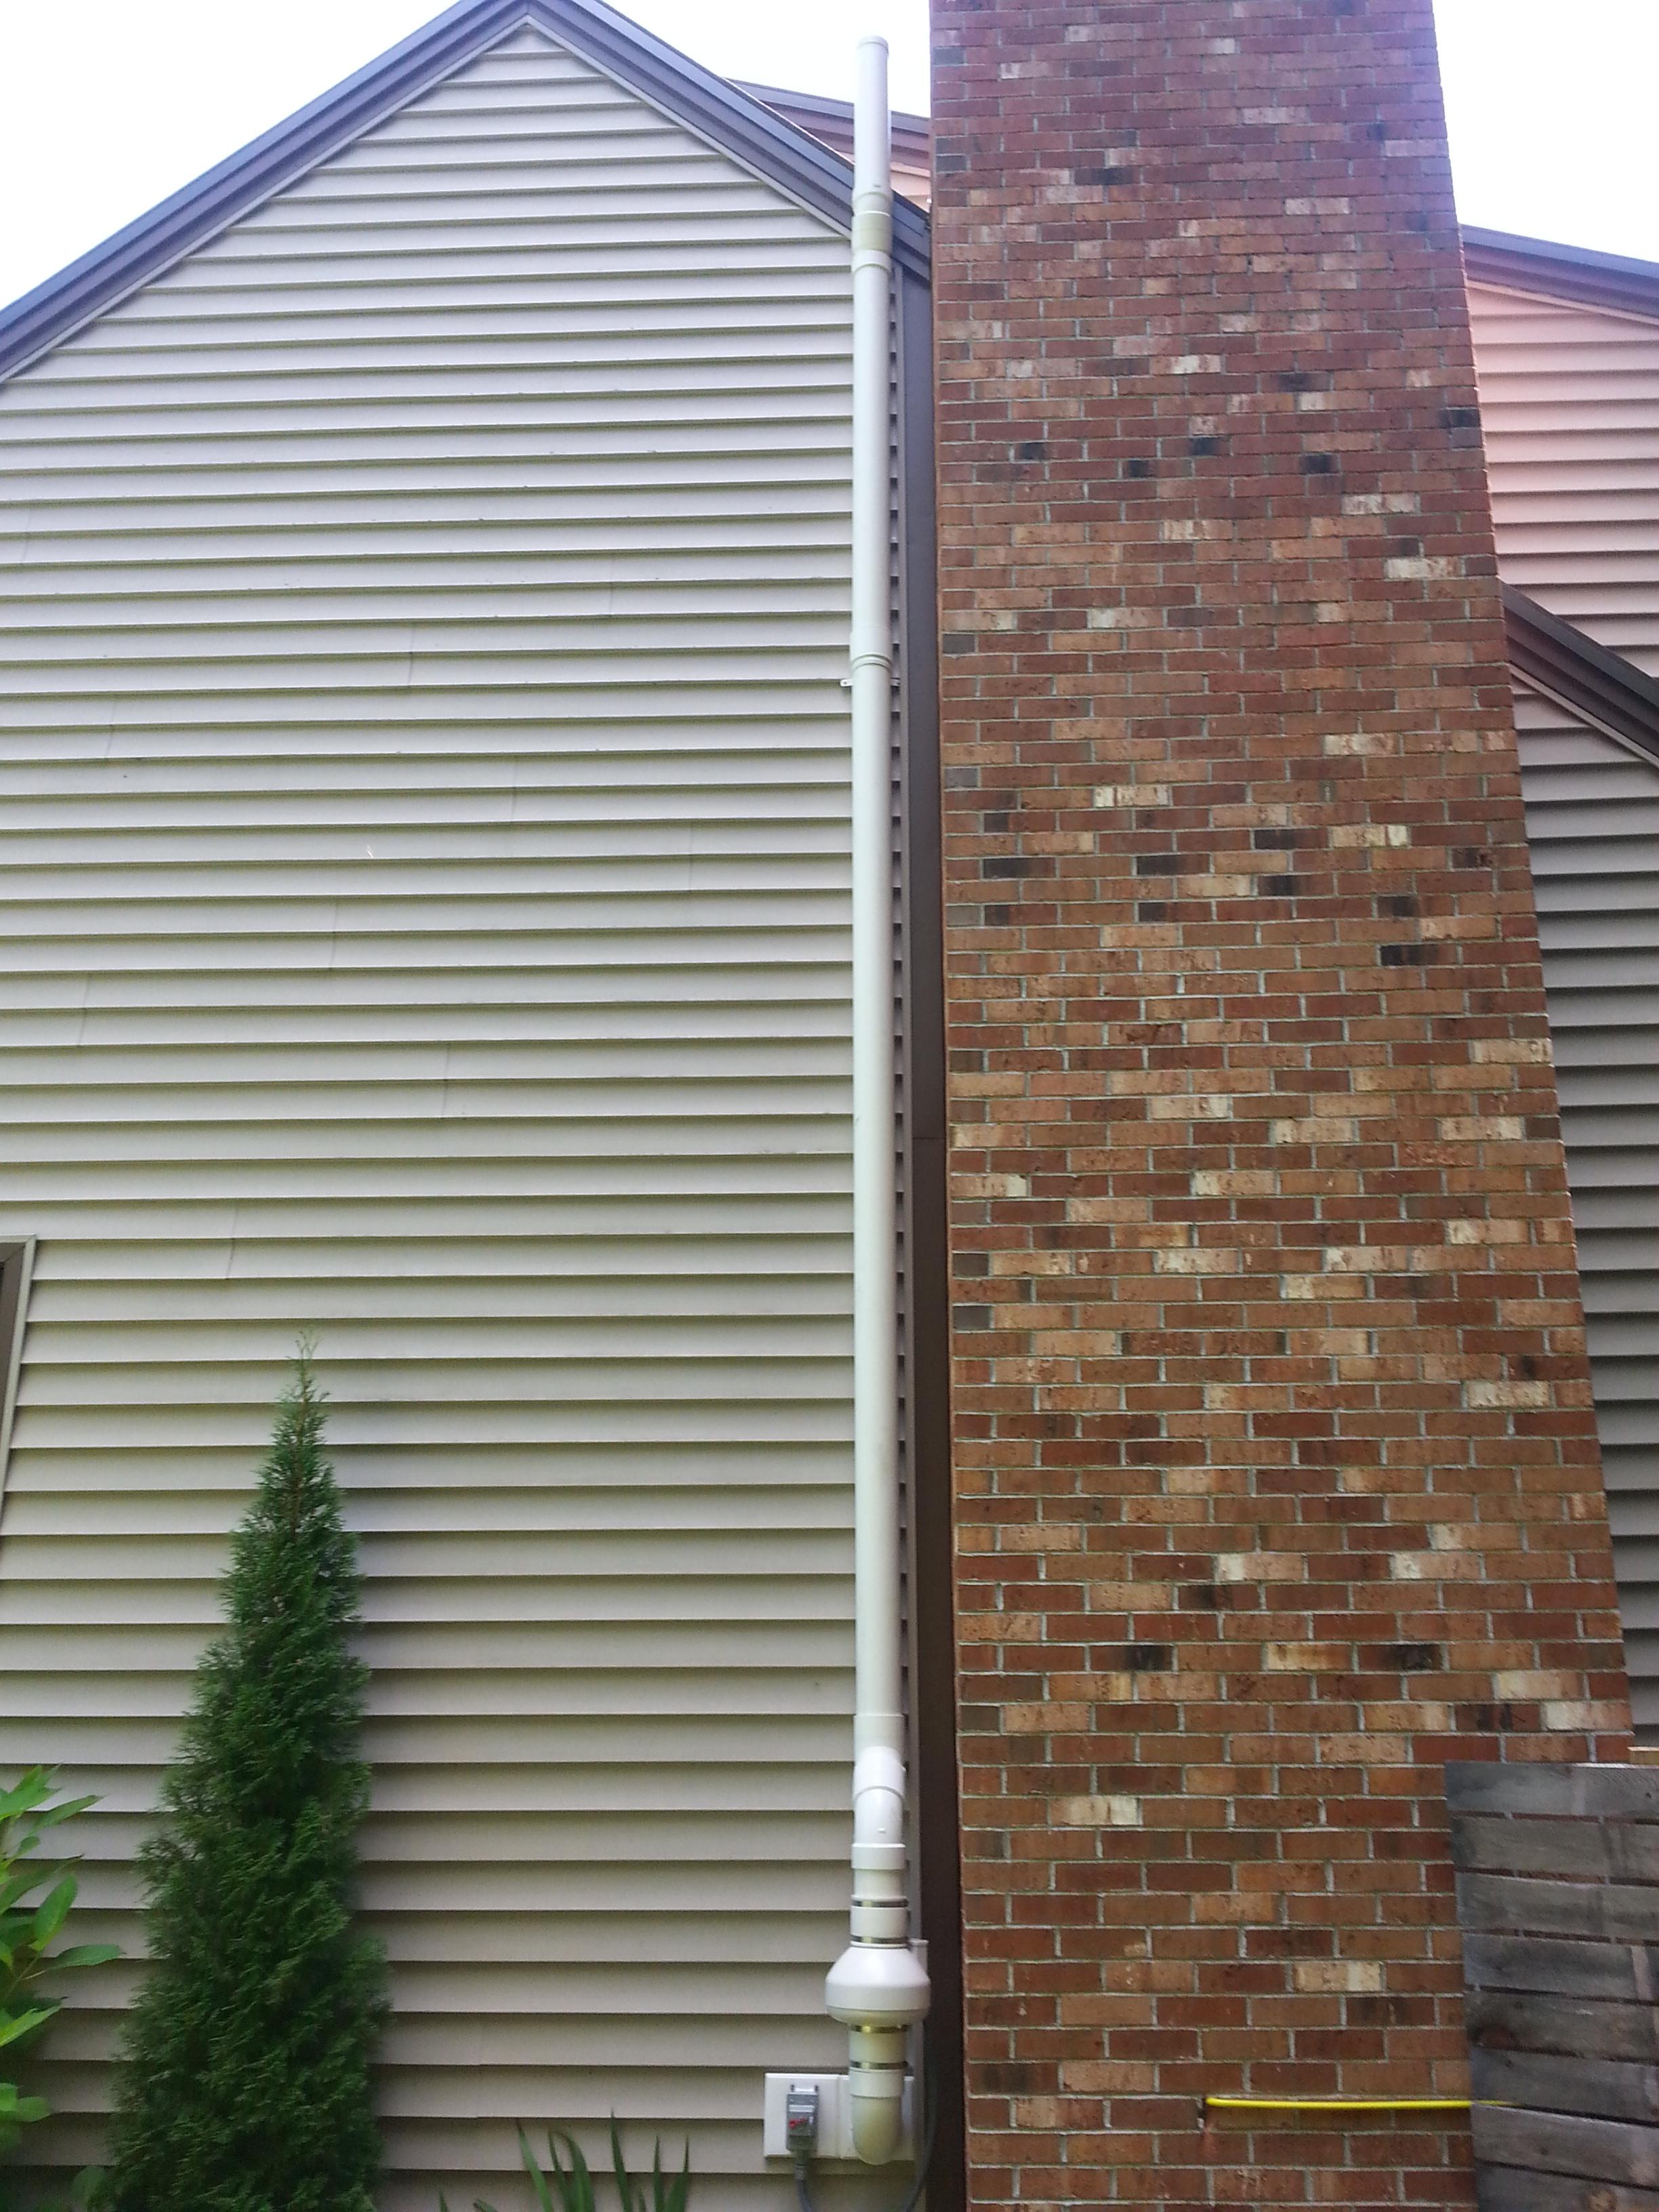 Discrete location for radon fan